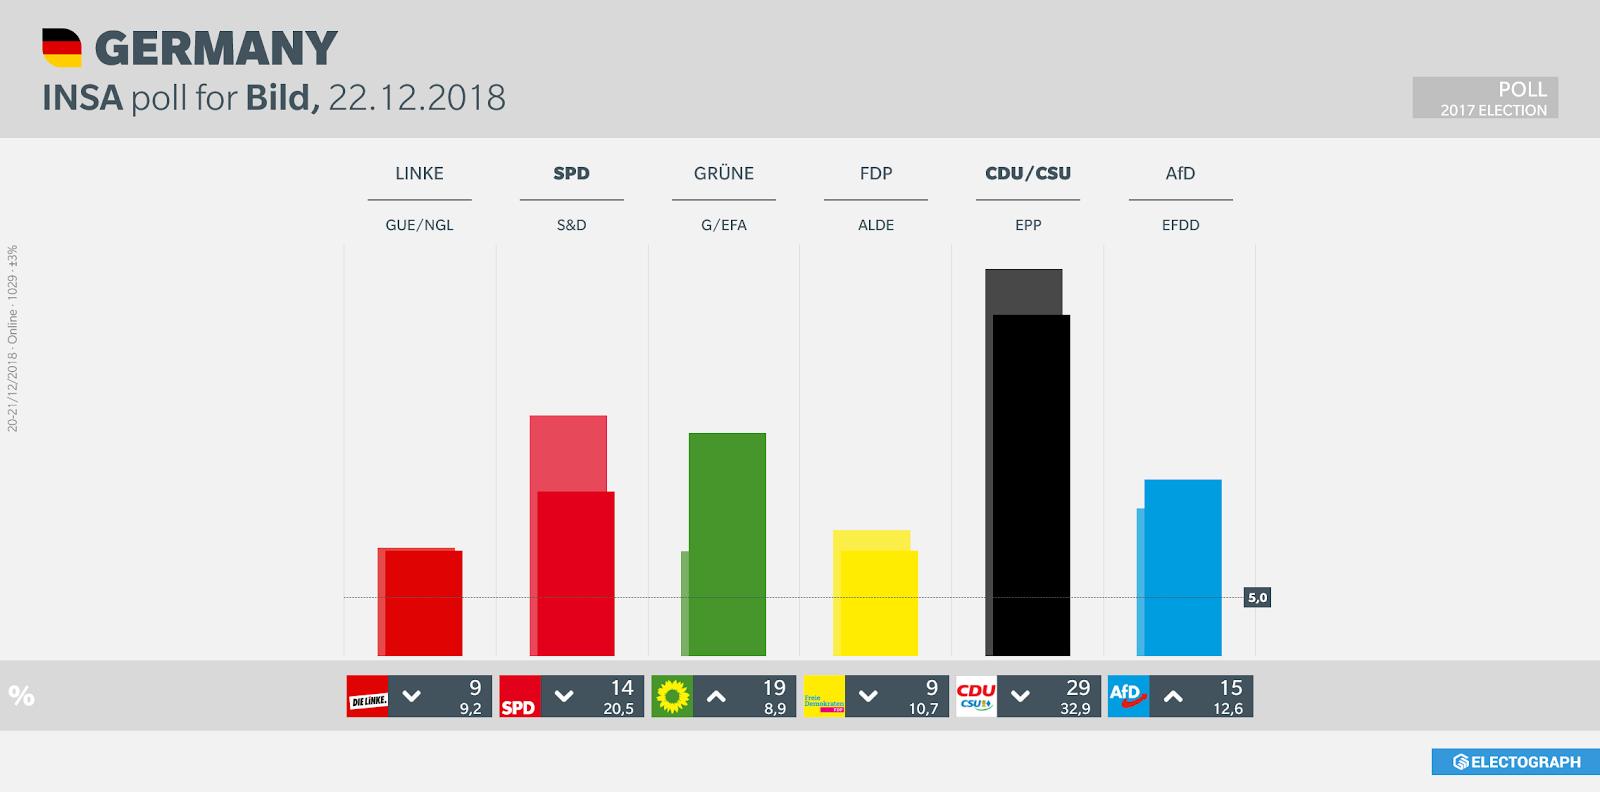 GERMANY: INSA poll chart for Bild, 22 December 2018